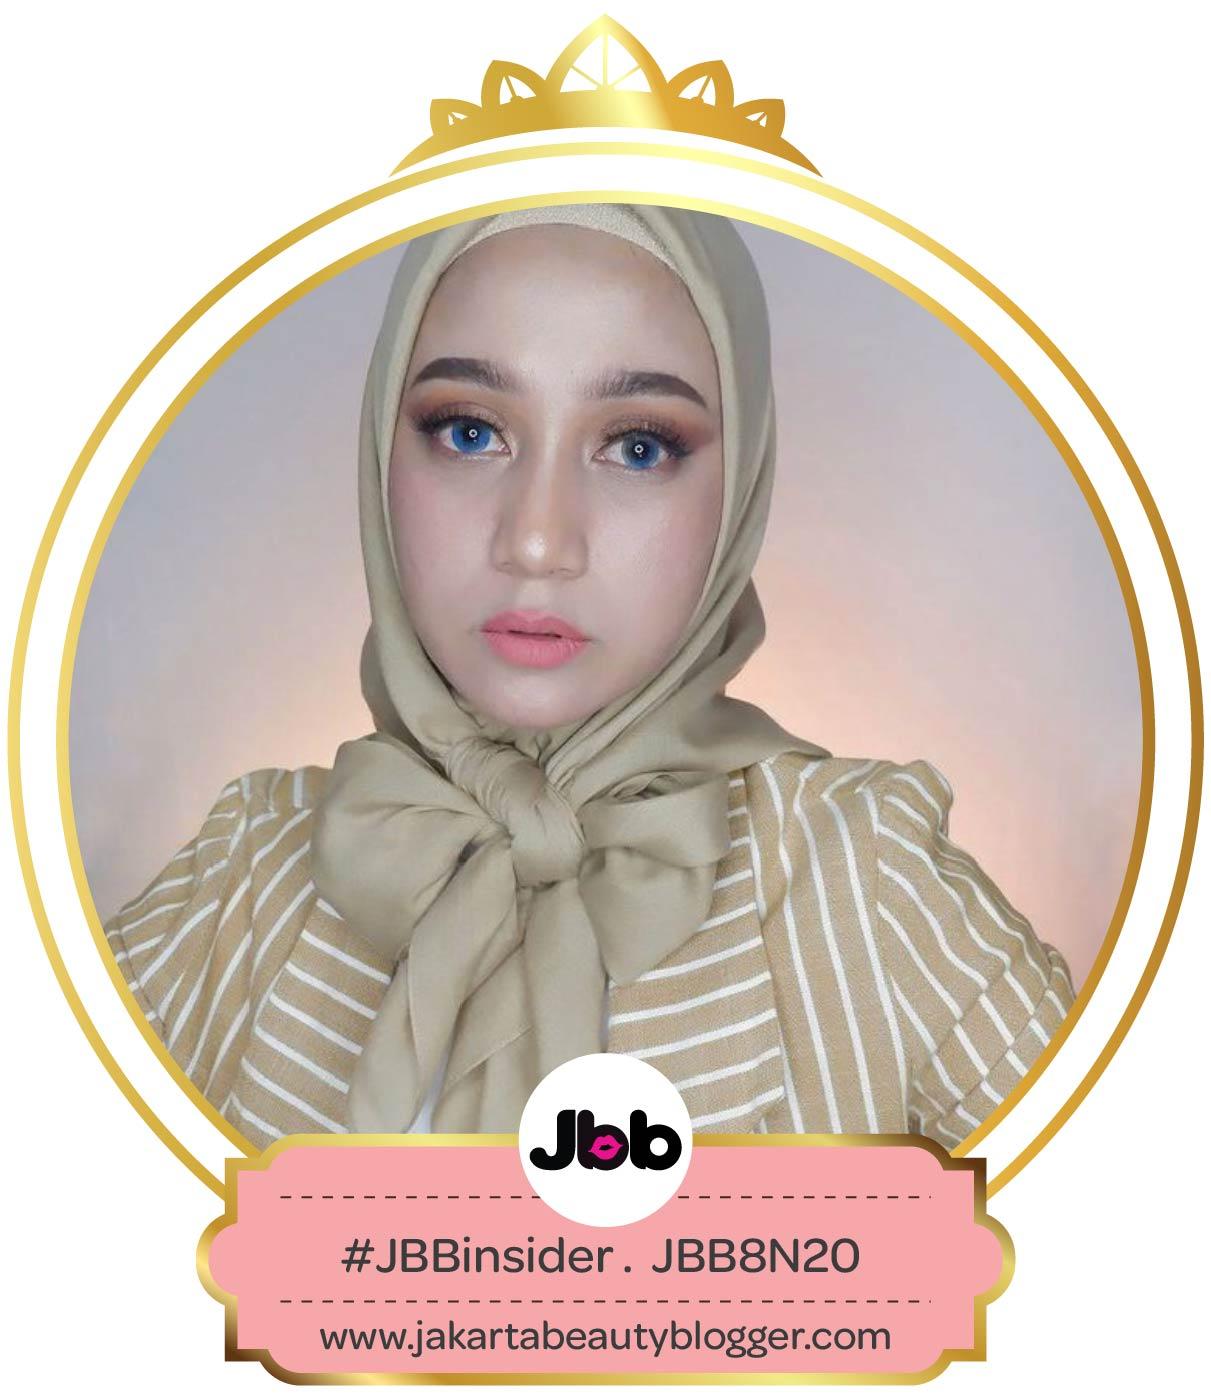 https://www.jakartabeautyblogger.com/jbb-insider/